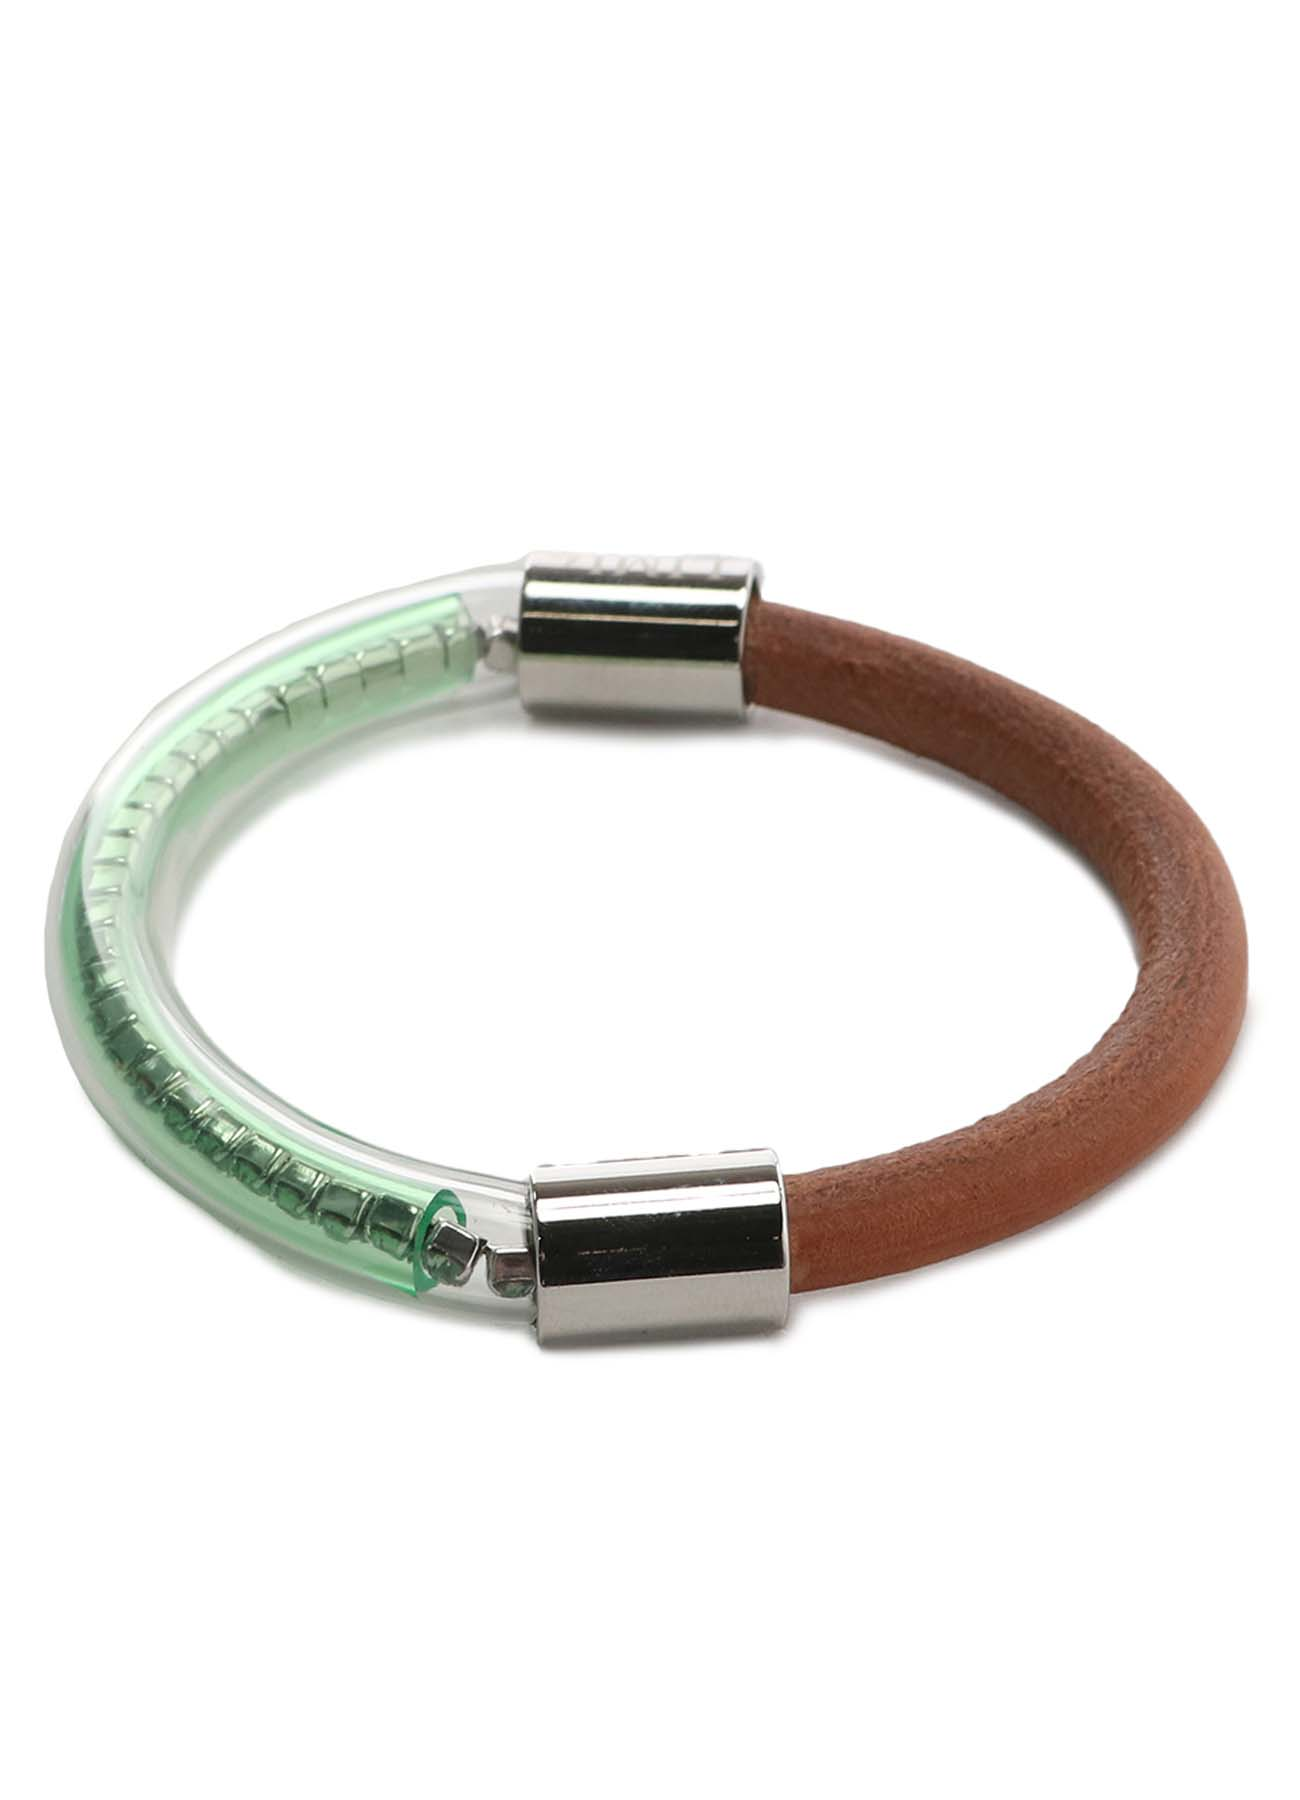 Leather Cord Tube Bracelet